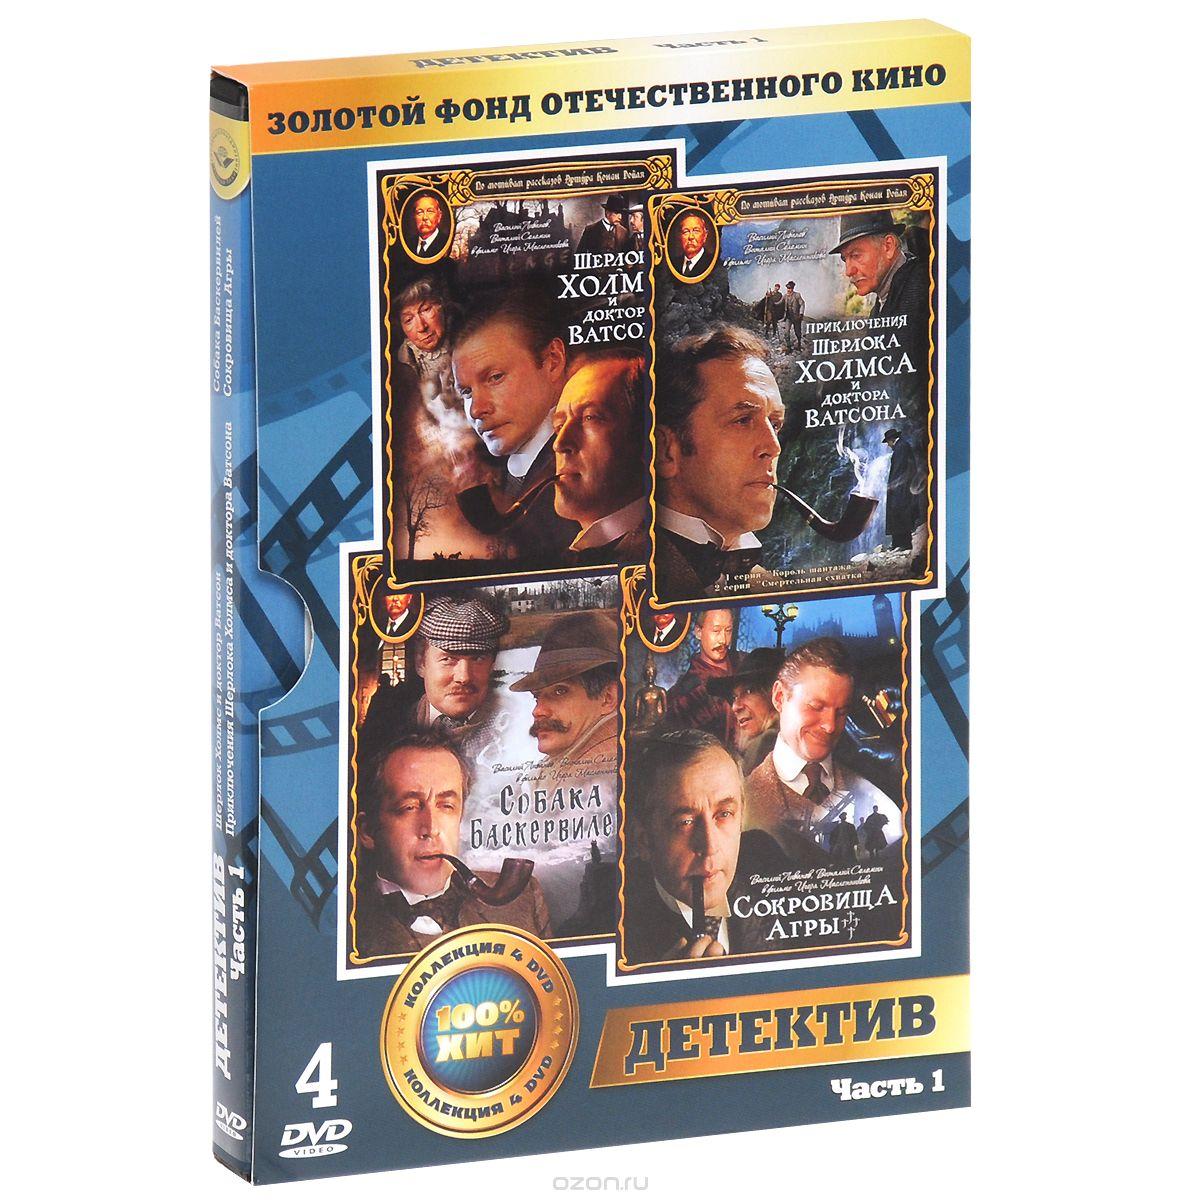 Шерлок Холмс и доктор Ватсон / Приключения Шерлока Холмса и доктора Ватсона / Собака Баскервилей / С